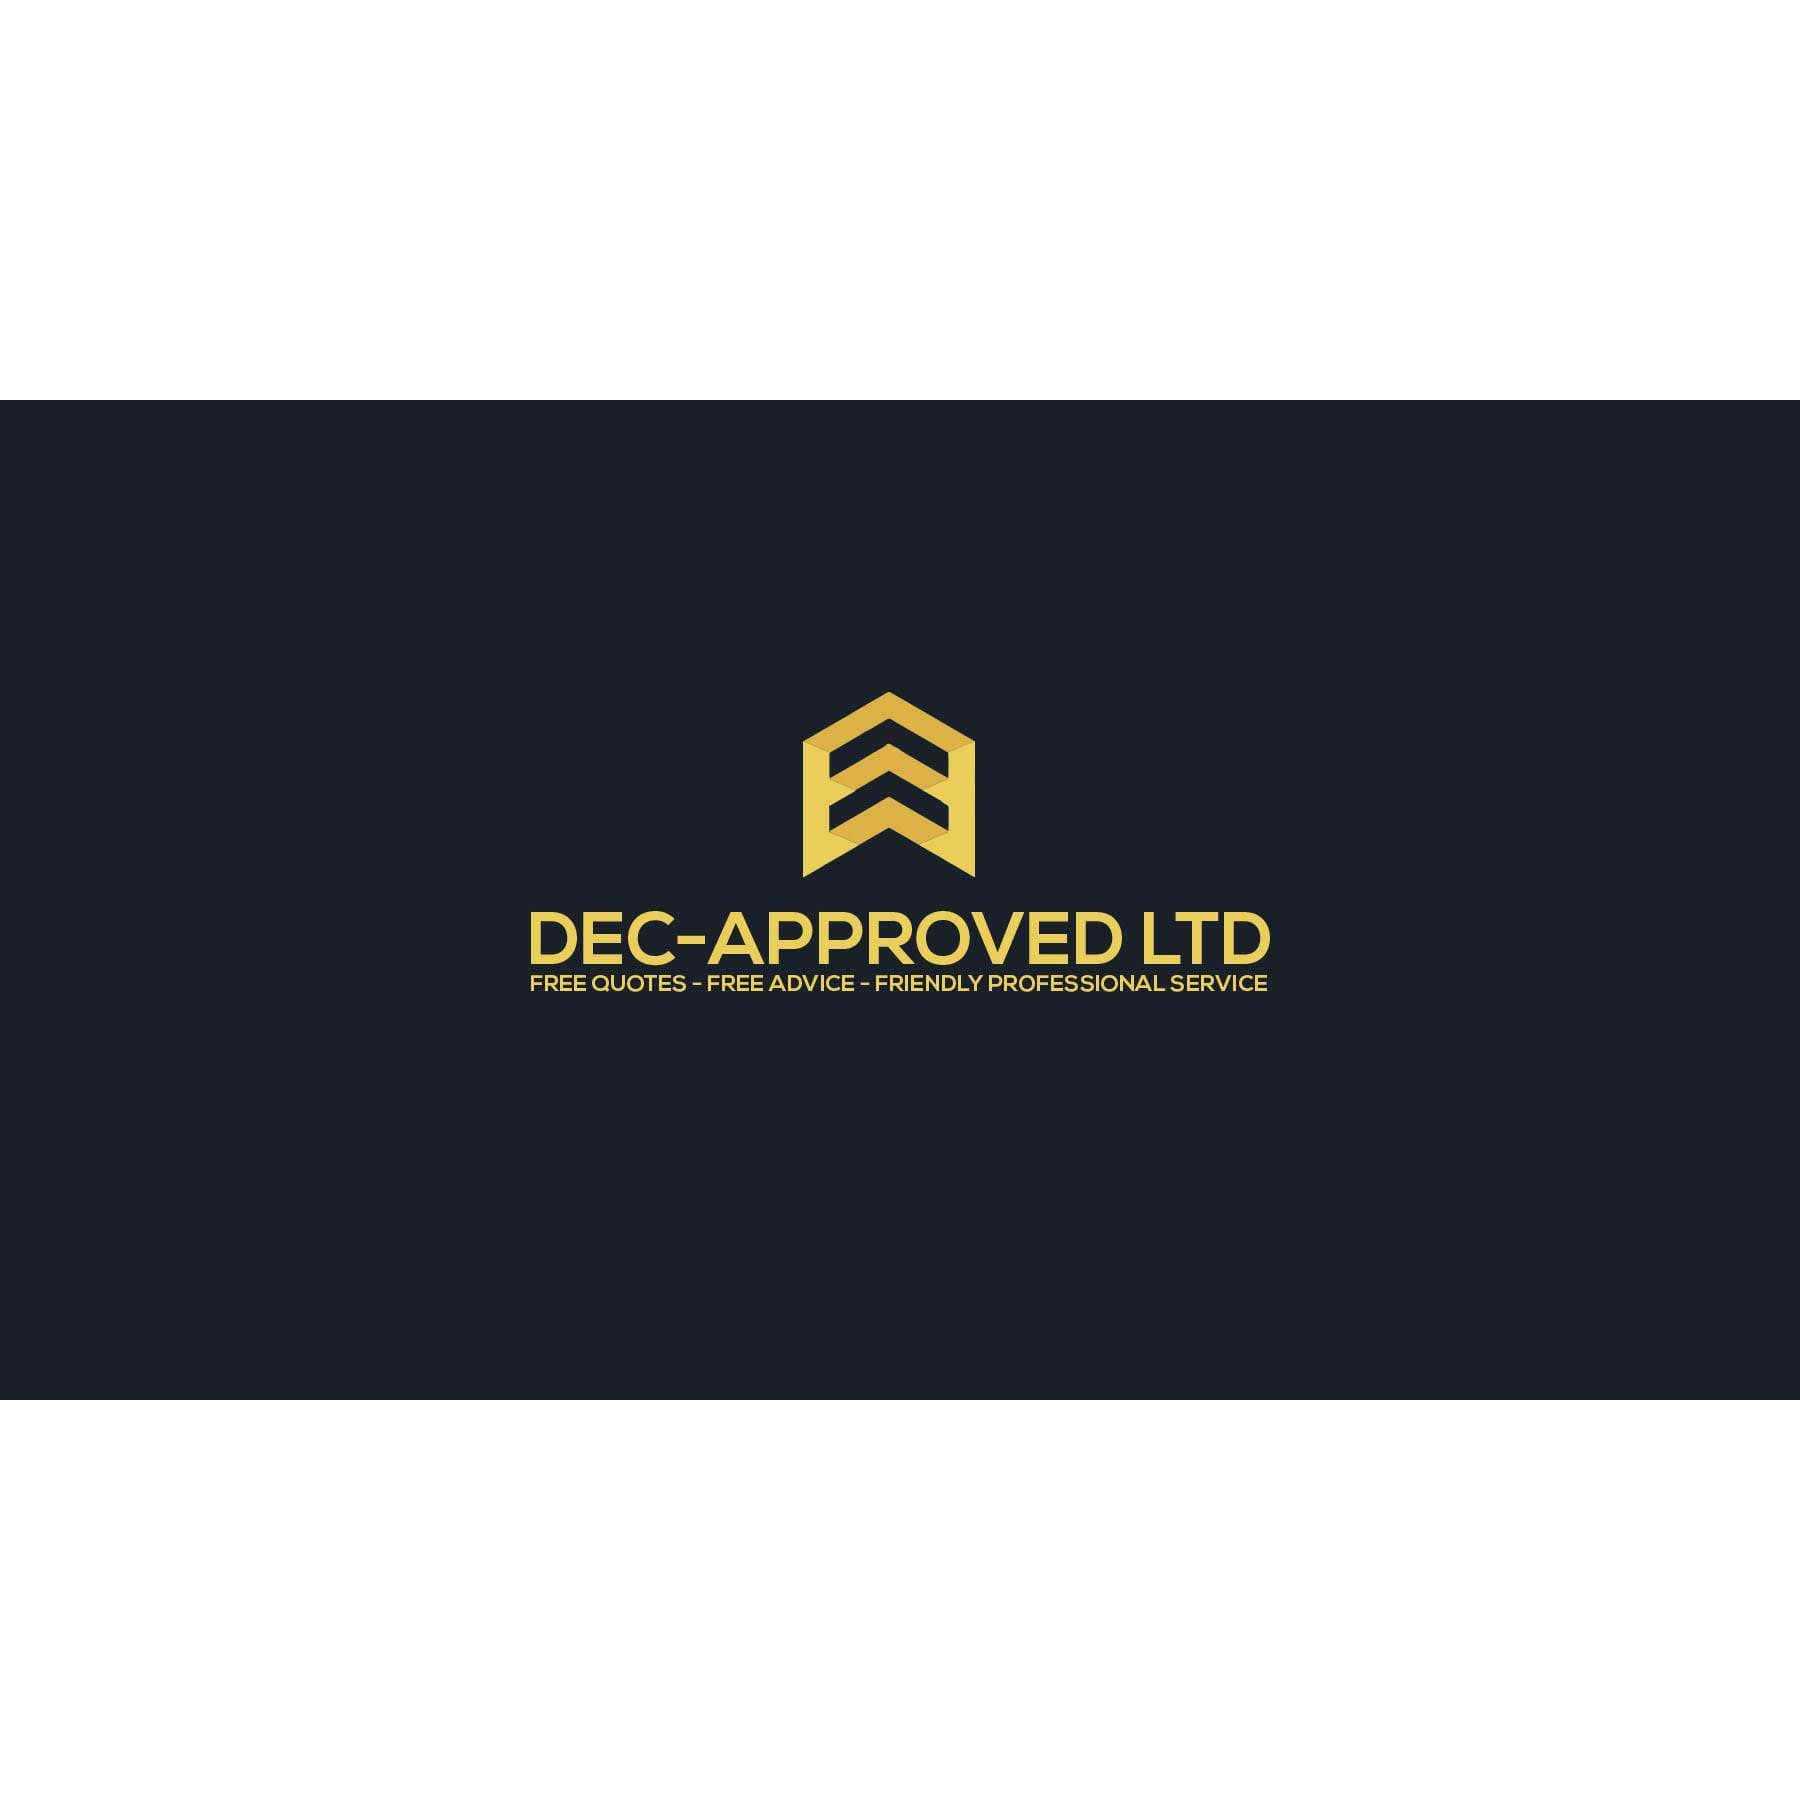 D E C Approved Ltd - Ashton-Under-Lyne, Lancashire OL6 7DW - 01613 302480 | ShowMeLocal.com